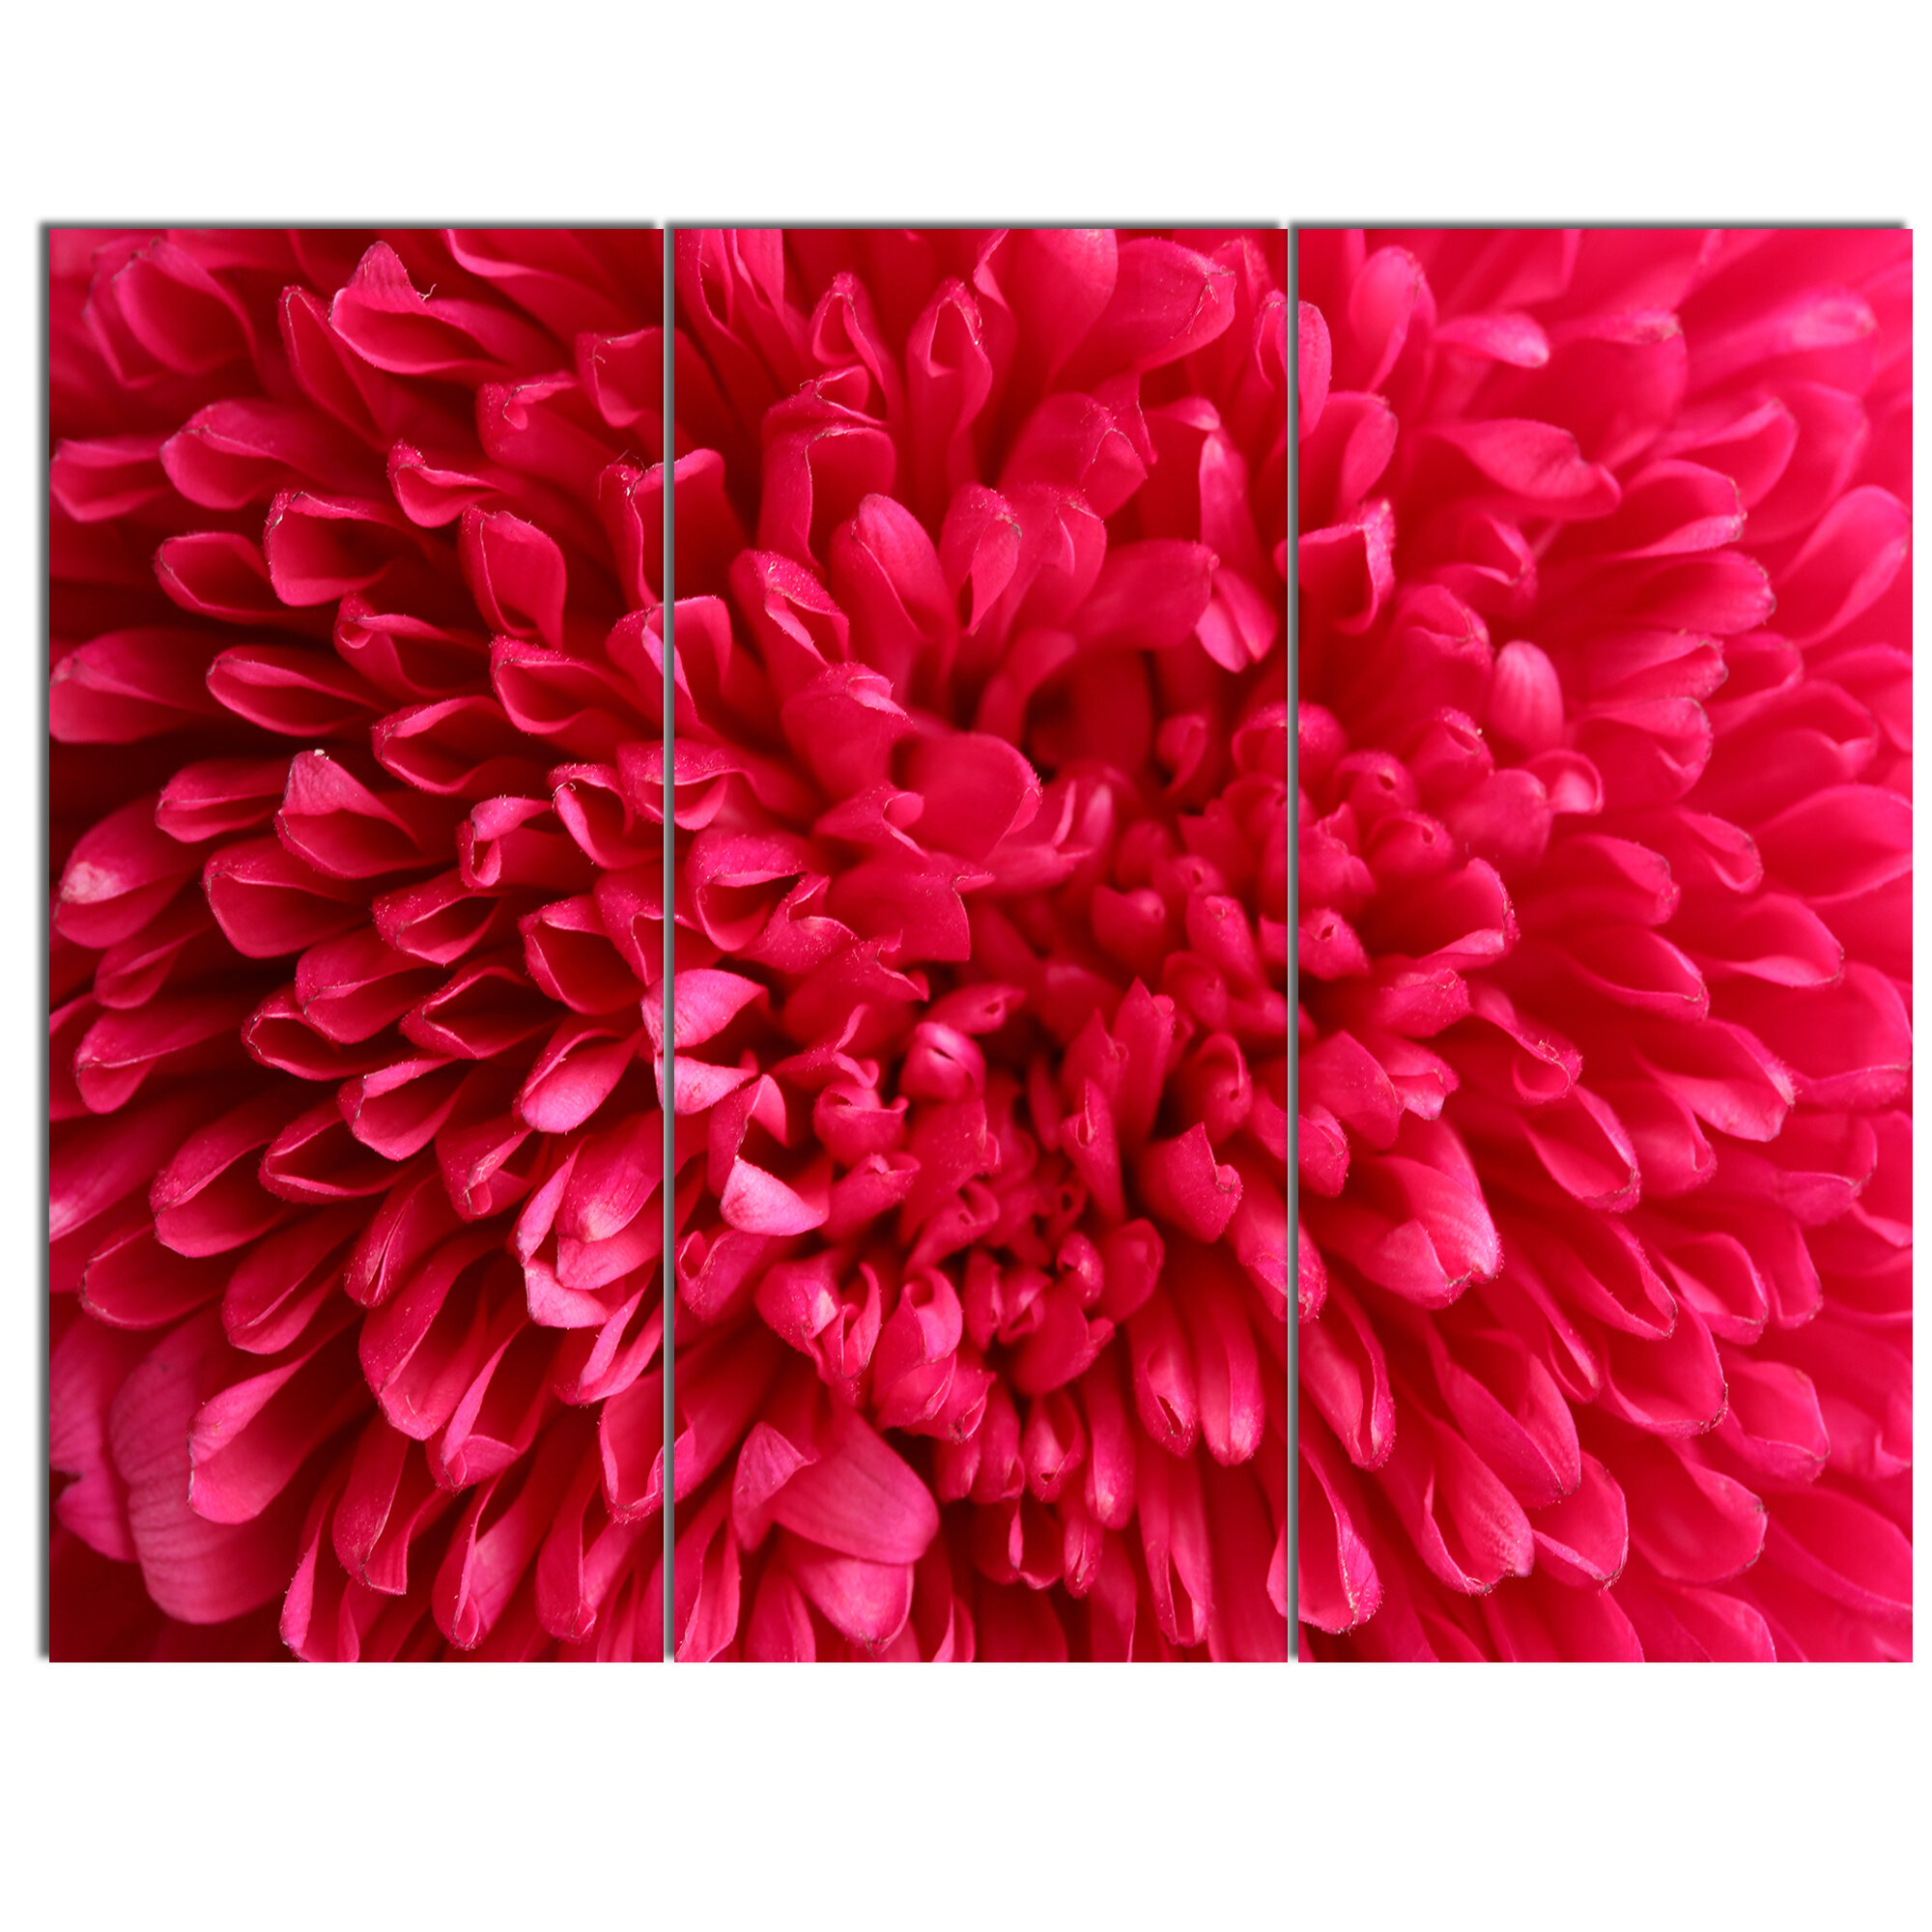 Designart Pink Aster Flower Petals Close Up 3 Piece Photographic